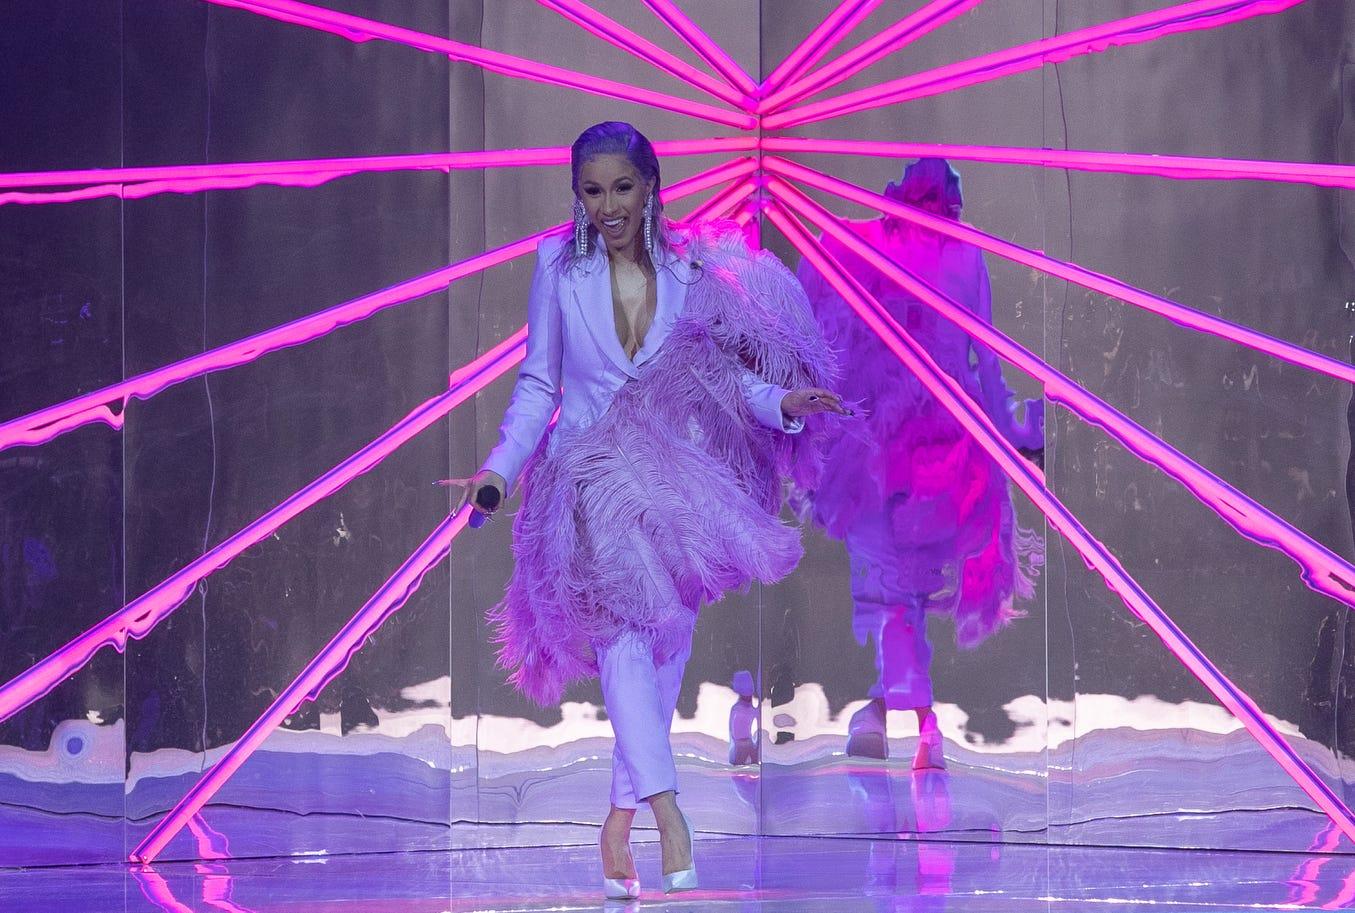 Cardi B. performs during the ETAM show as part of the Paris Fashion Week Womenswear Spring/Summer 2019.